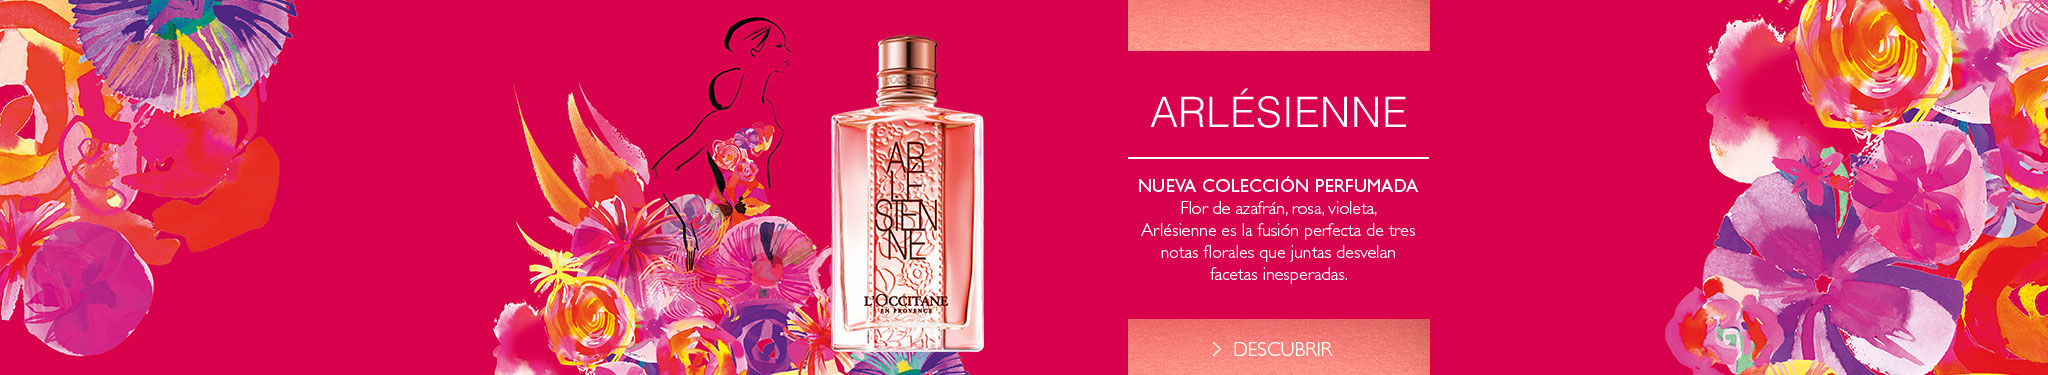 Arlesienne Perfume - L'Occitane en provence